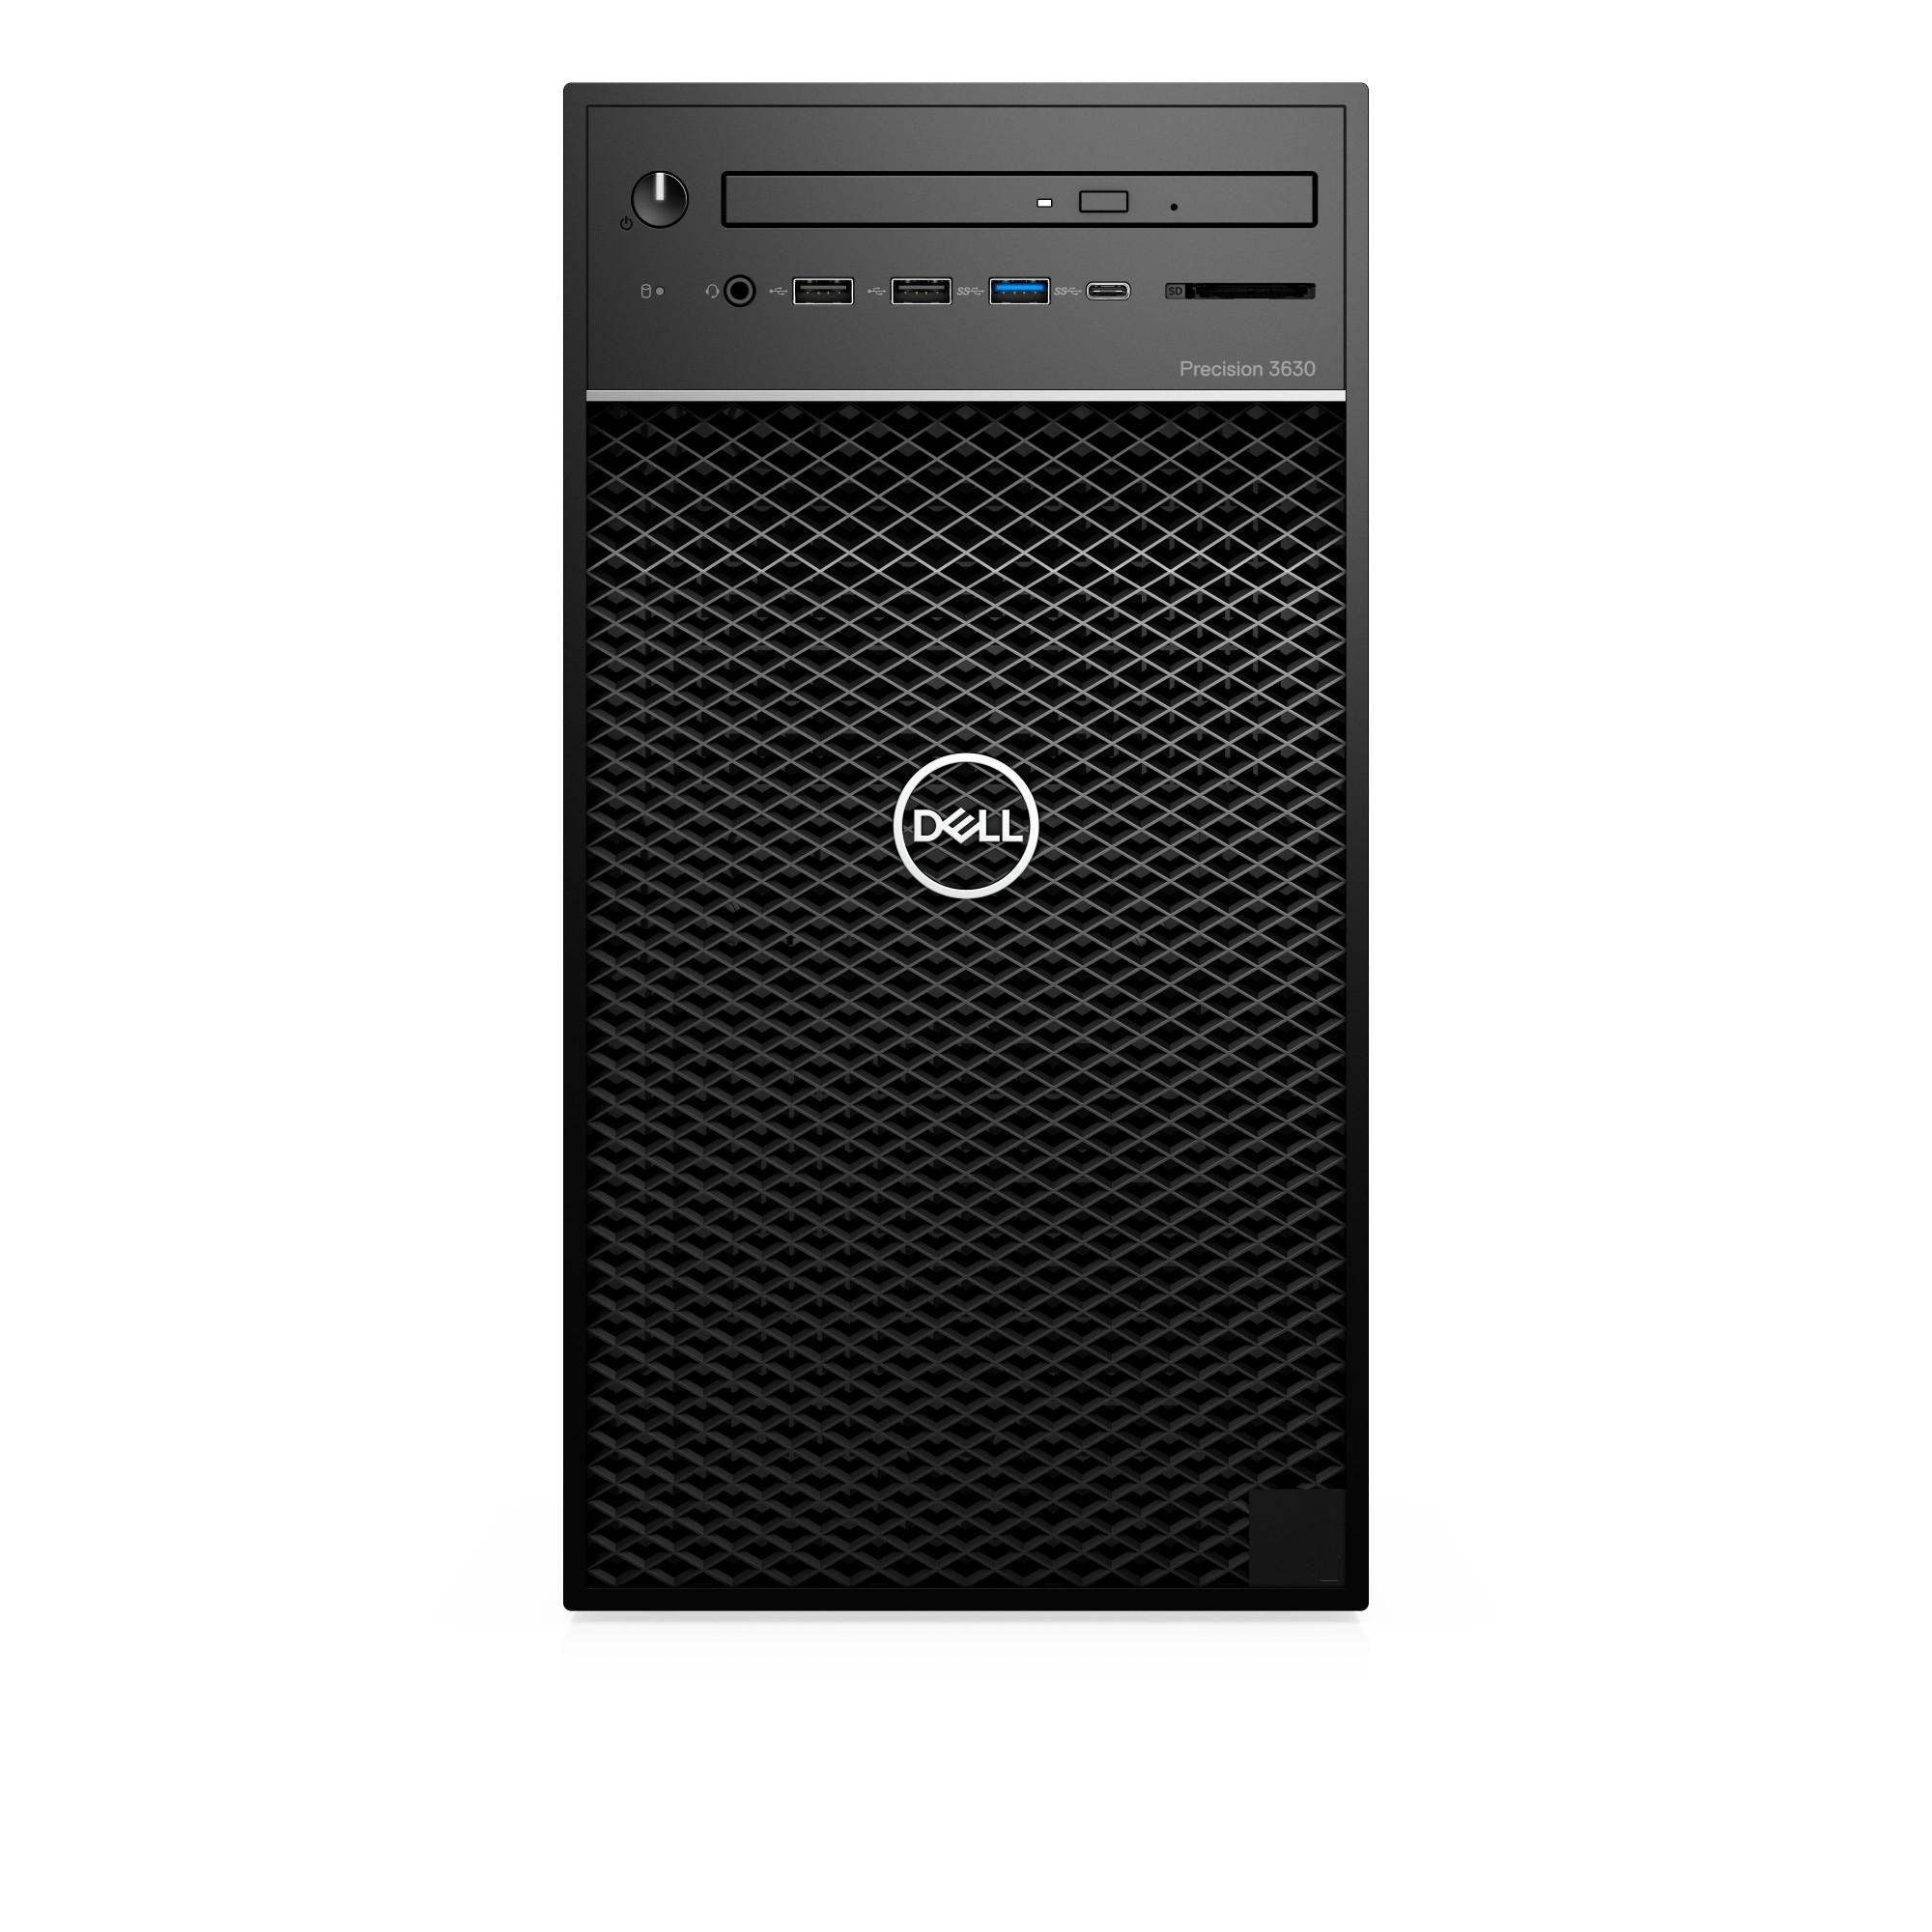 DELL Precision T3630 8th gen Intel® Core™ i7 i7-8700K 16 GB DDR4-SDRAM 1512 GB HDD+SSD Black Tower Workstation